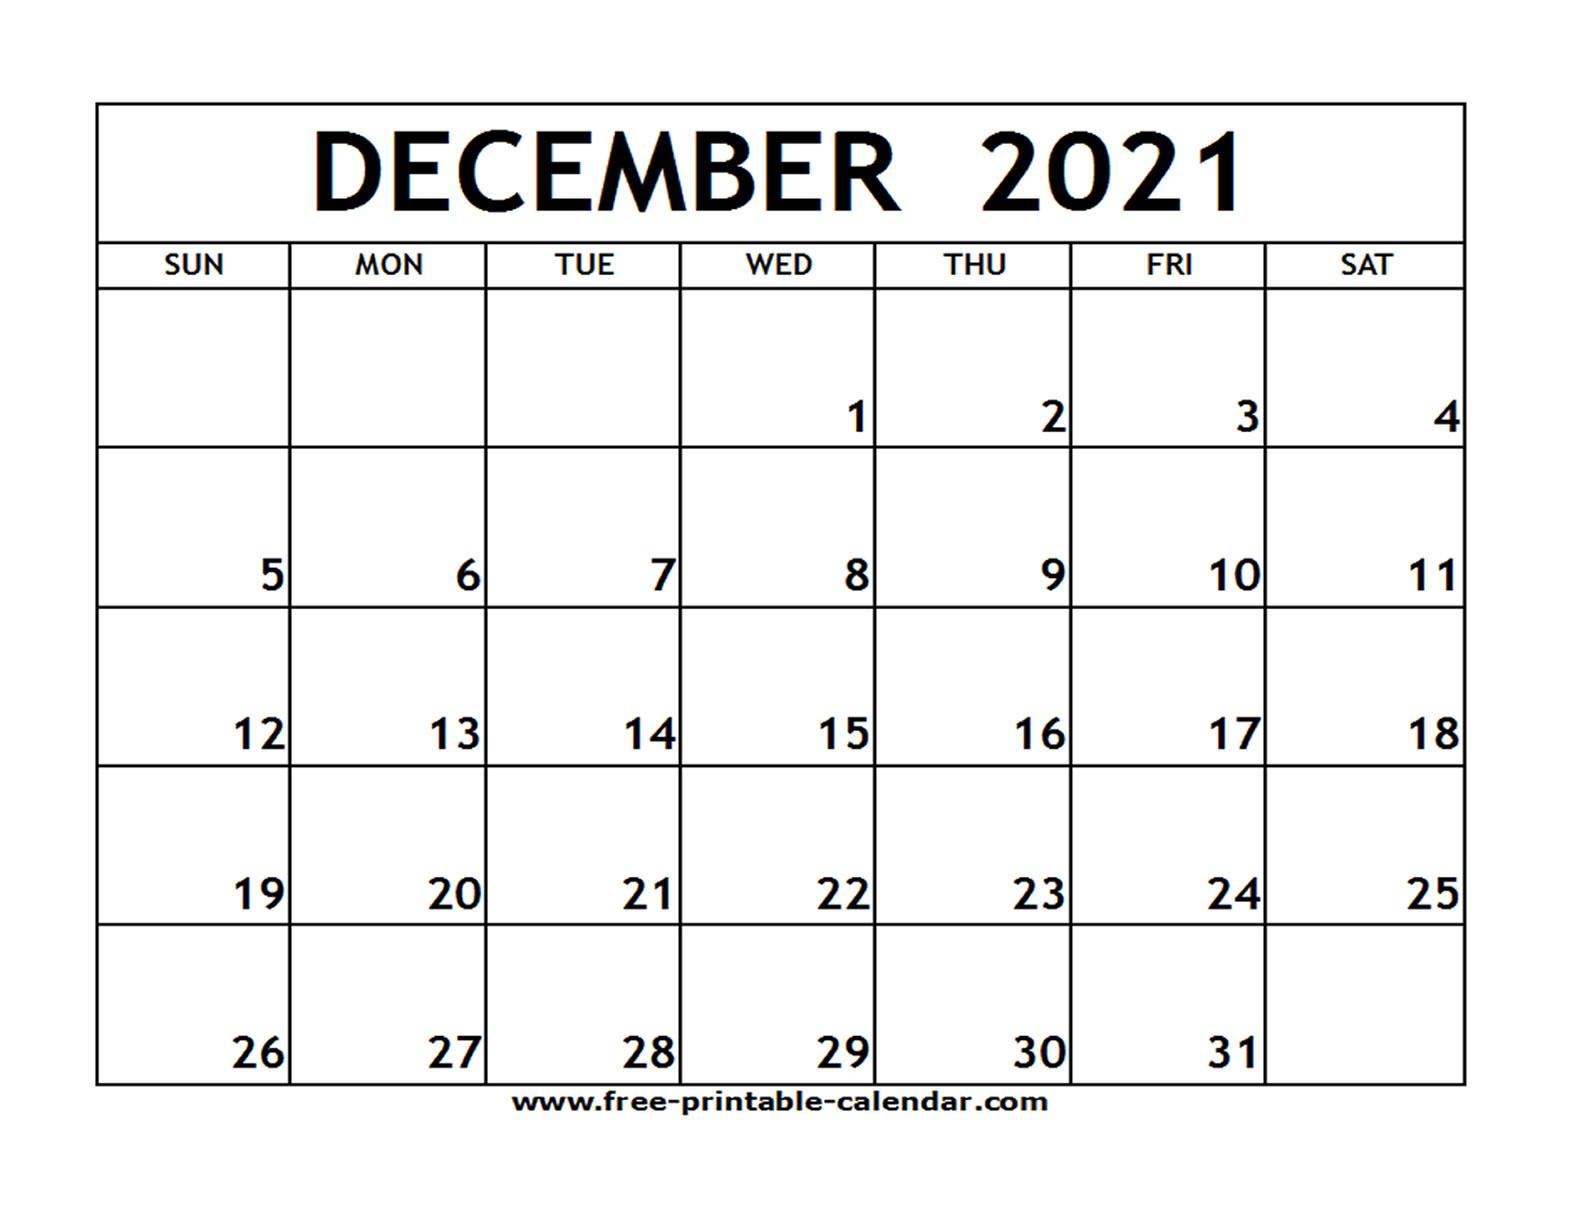 December 2021 Printable Calendar - Free-Printable-Calendar